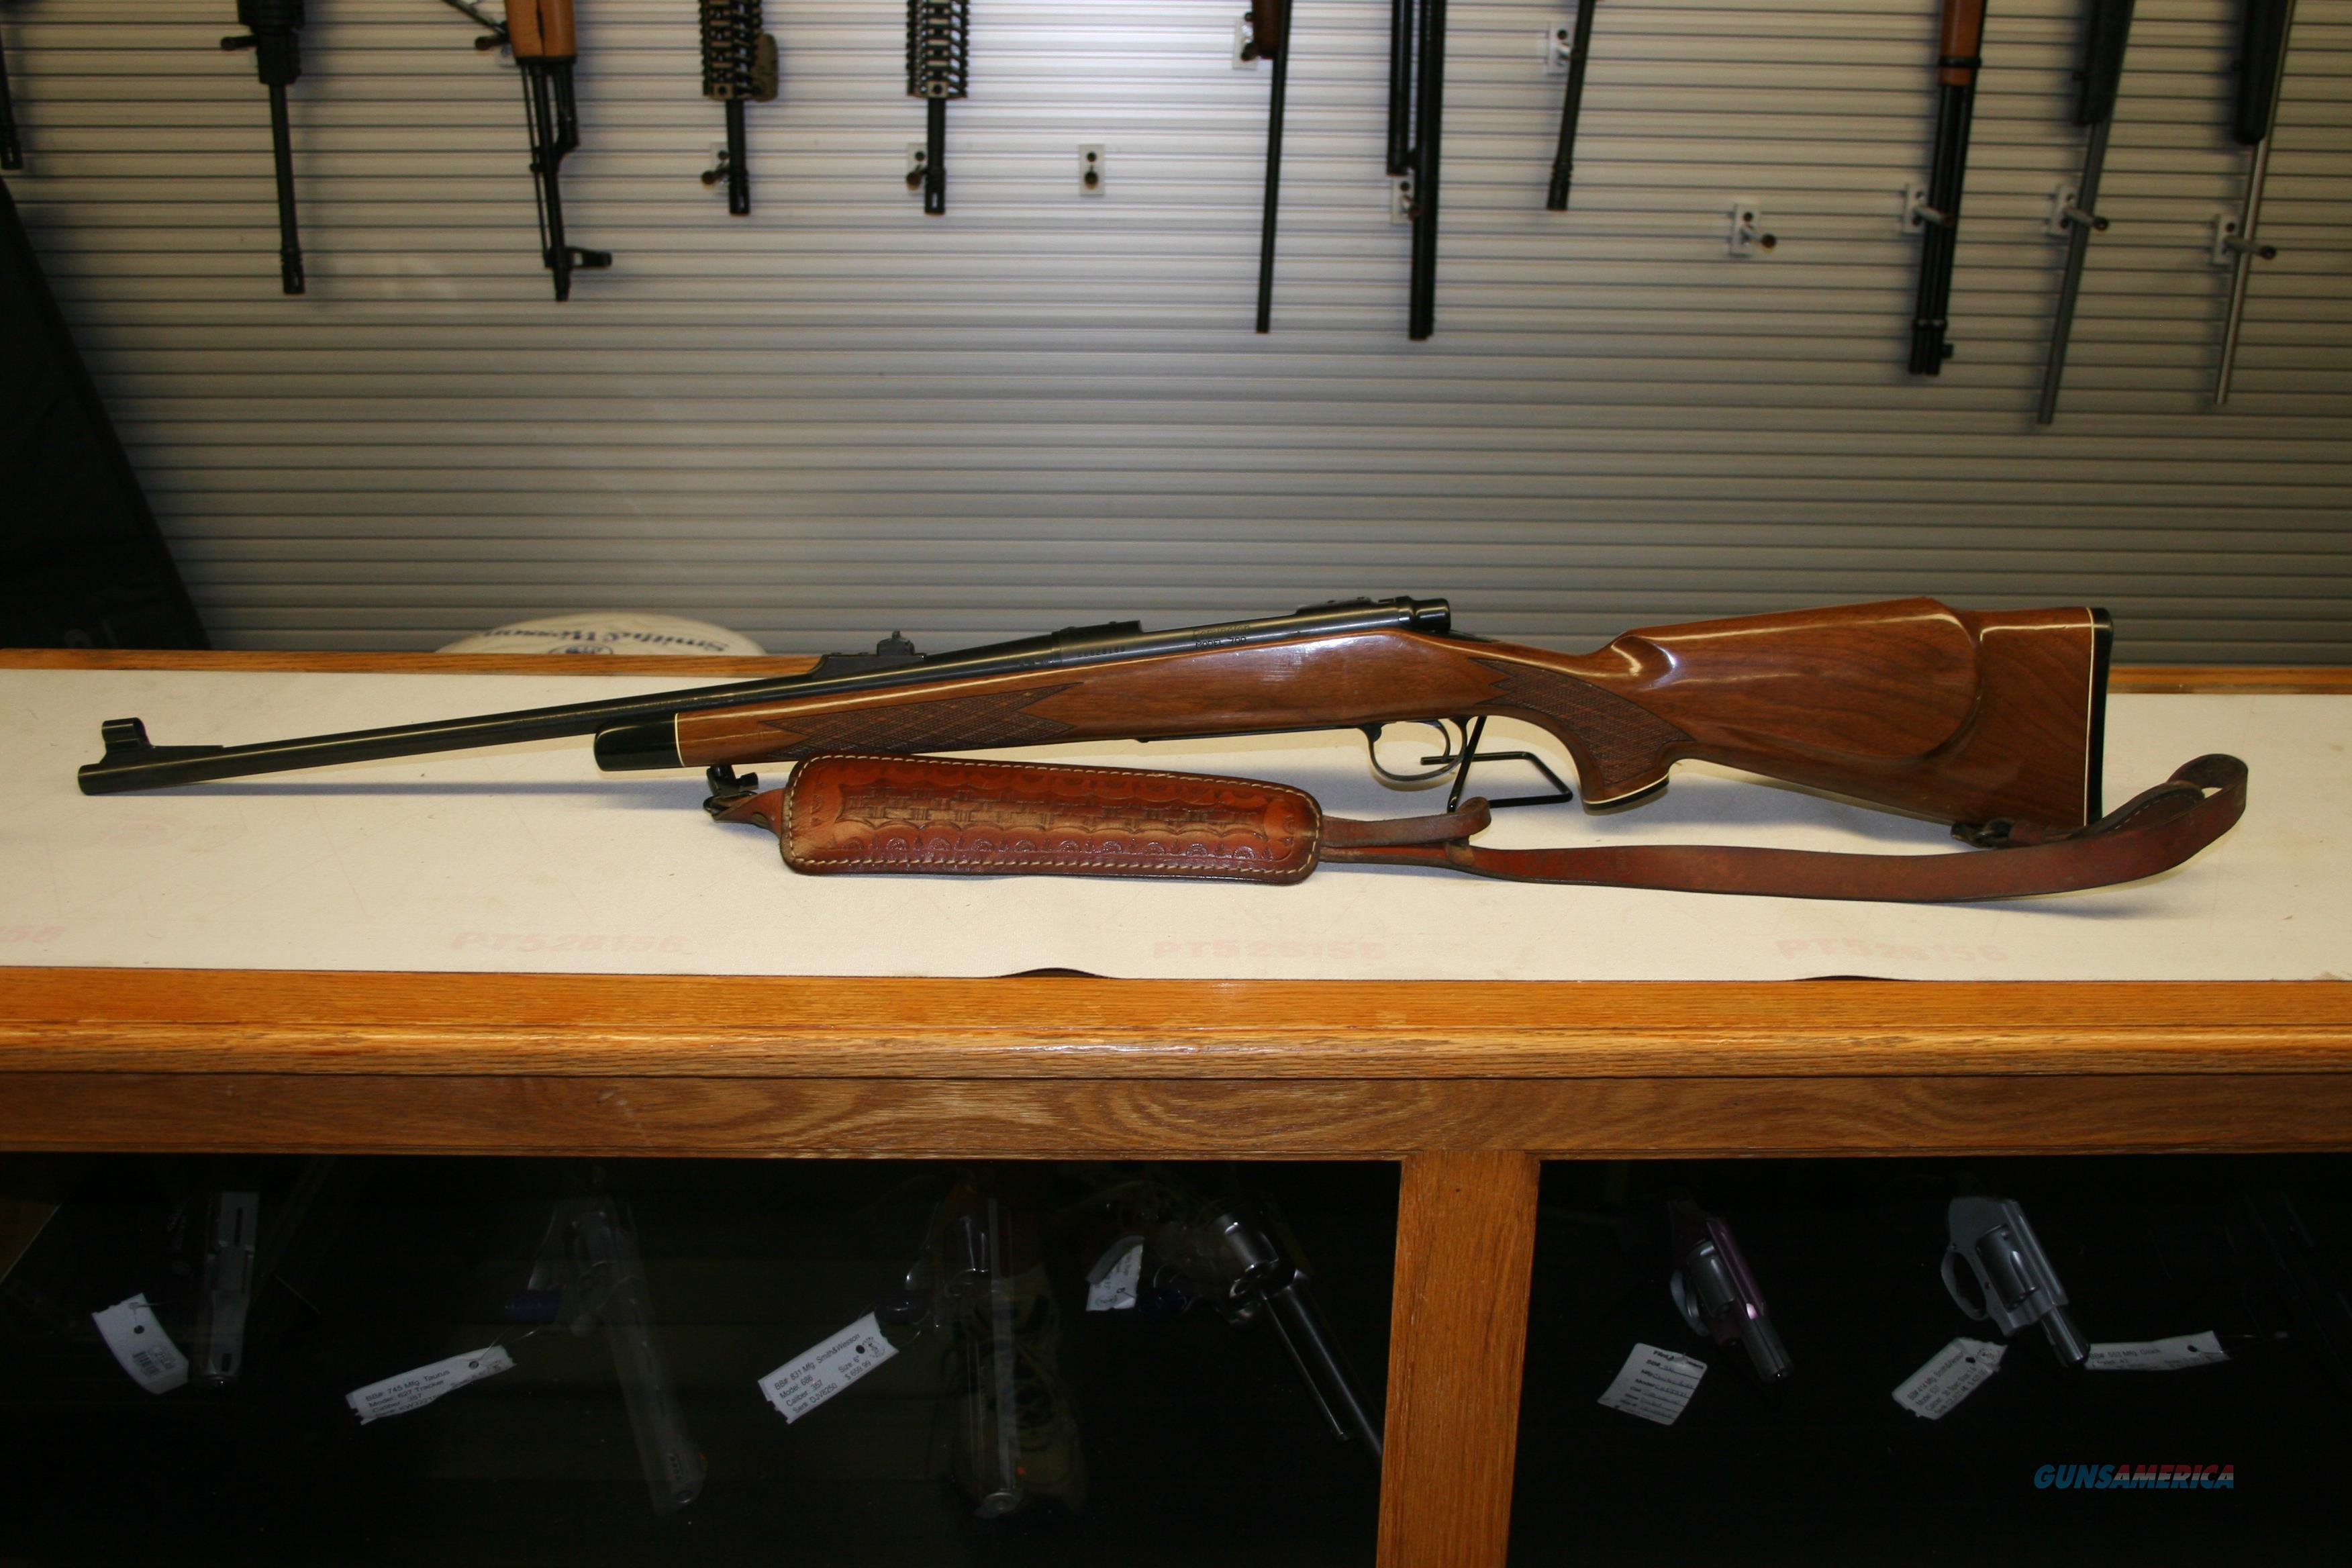 Remington Model 700 Bolt Action Rifle Walnut .30-06 Springfield  Guns > Rifles > Remington Rifles - Modern > Model 700 > Sporting